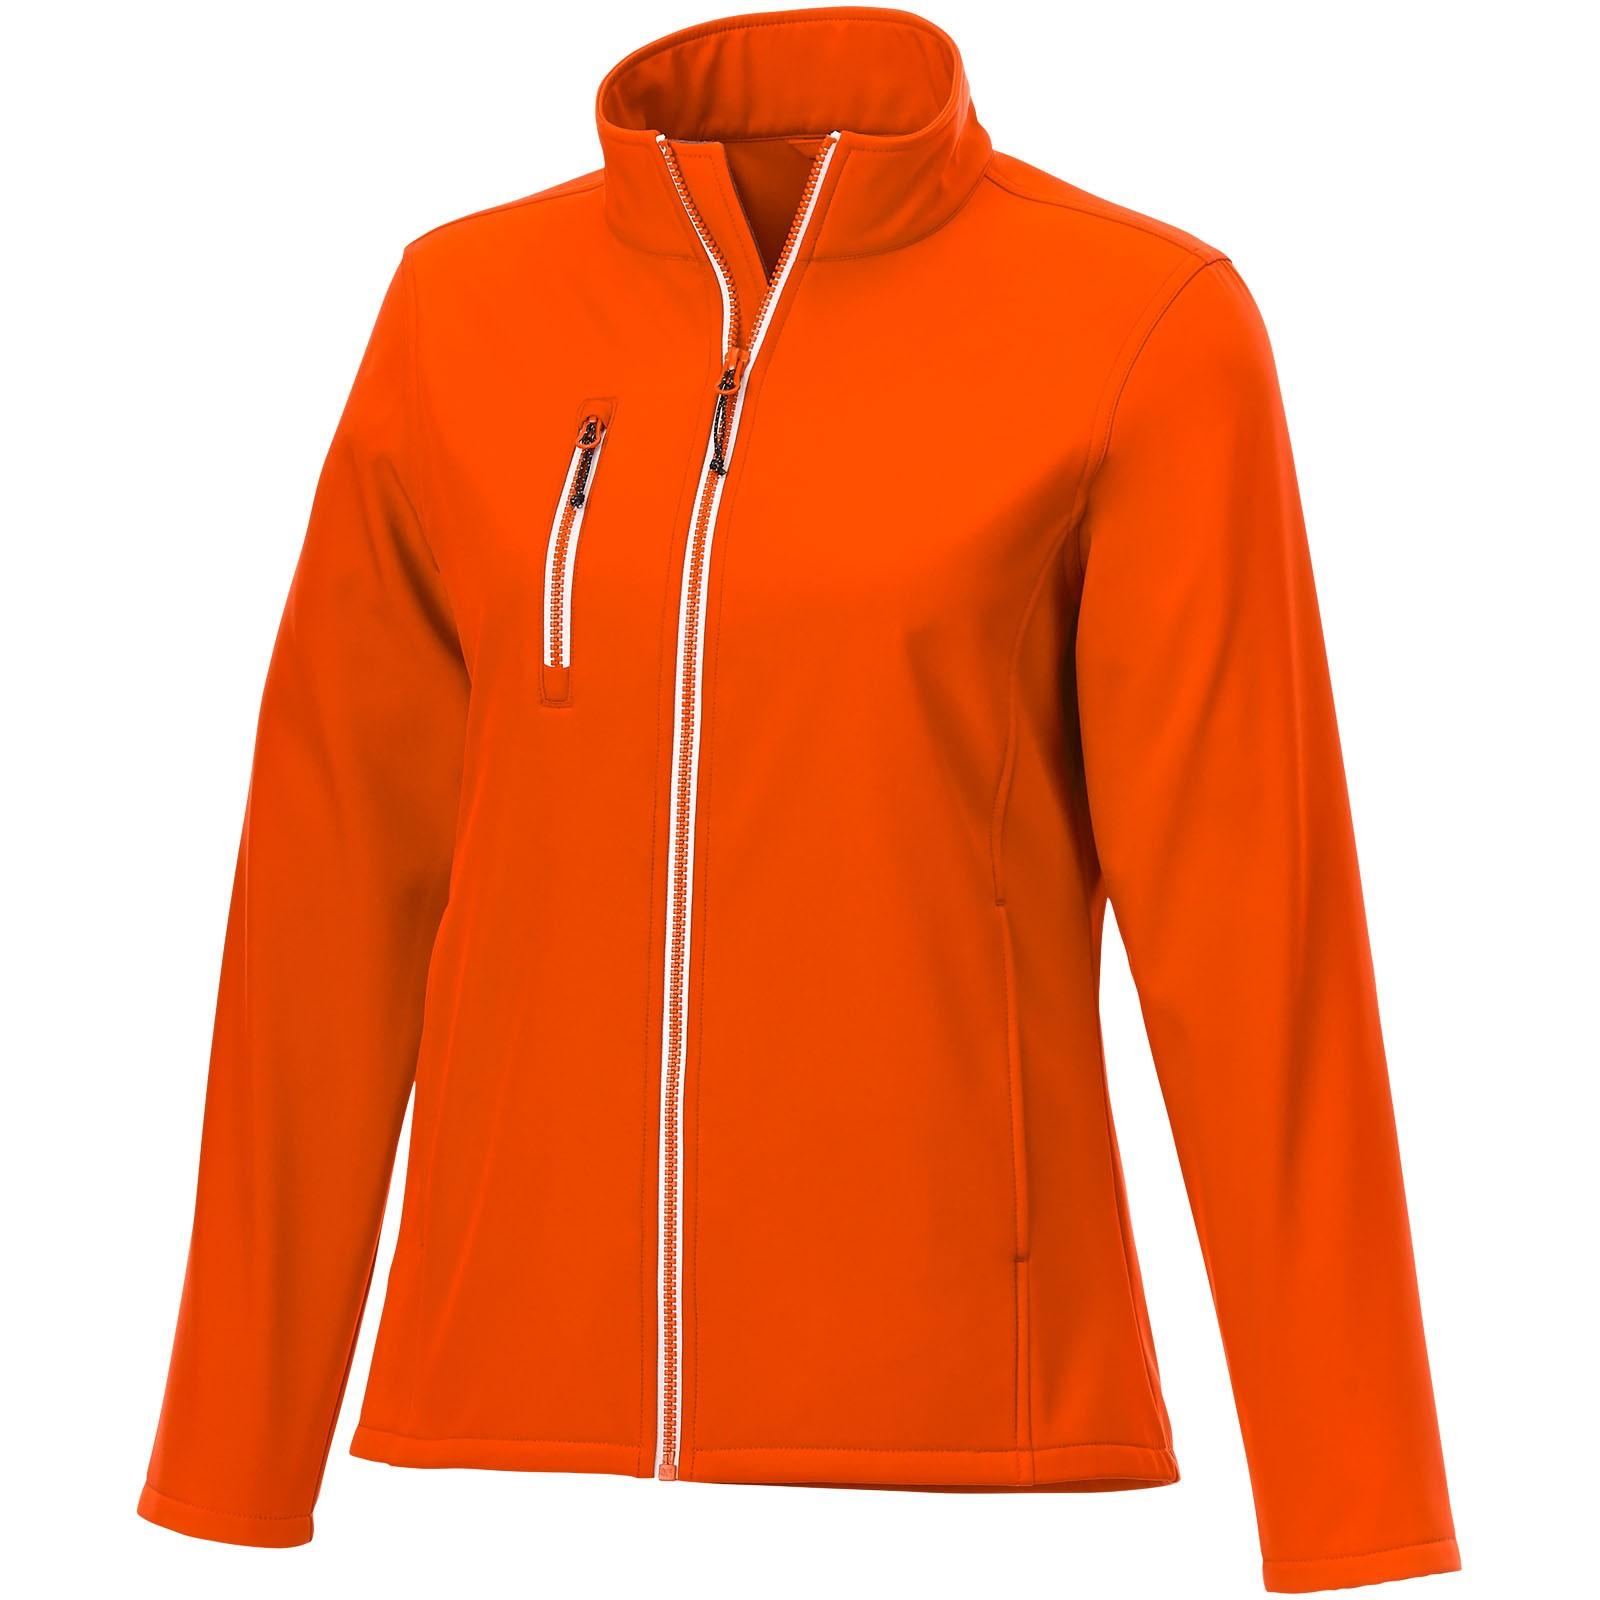 Orion women's softshell jacket - Orange / XS